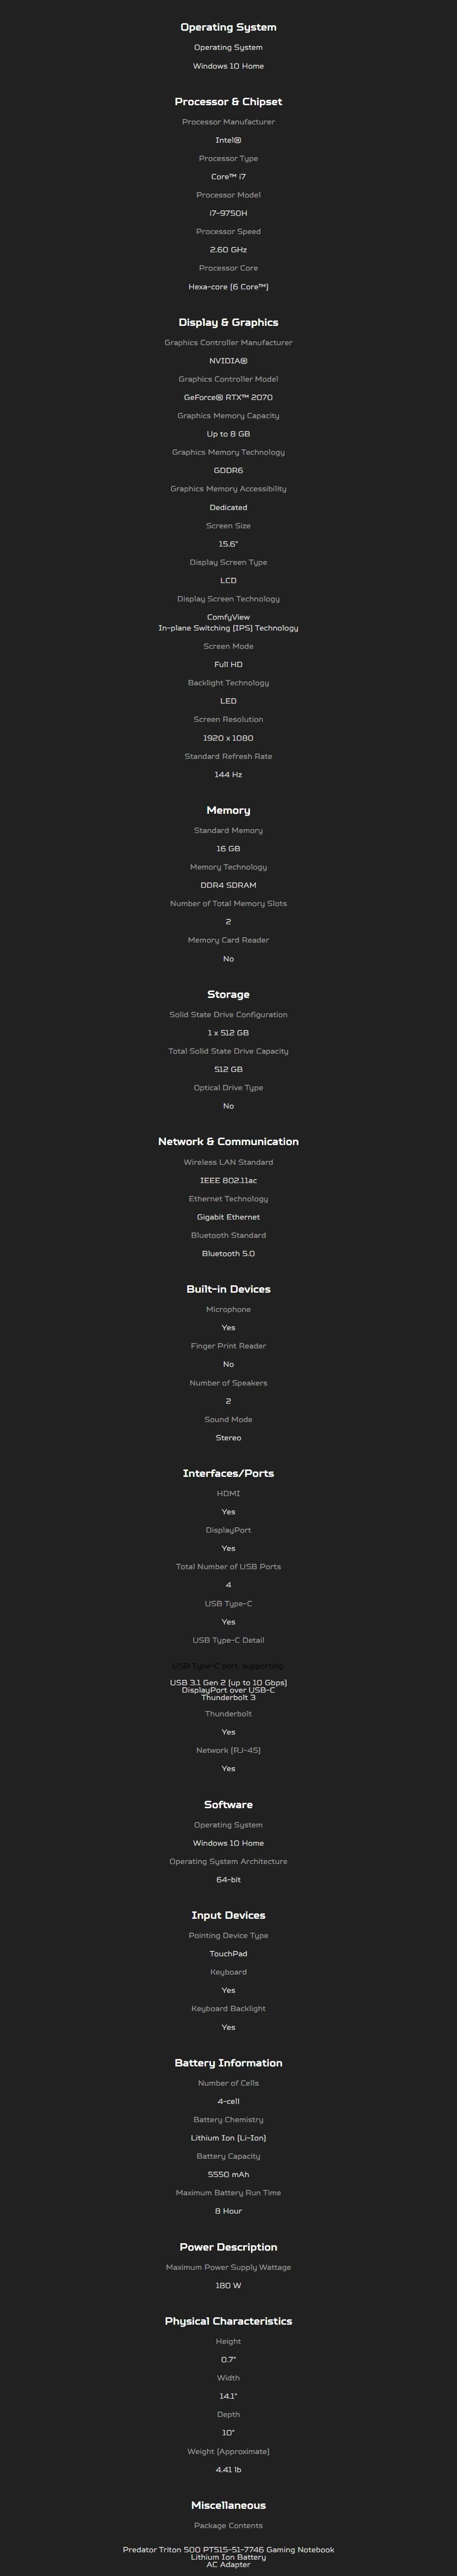 "Acer Predator Triton 500 15.6"" 144Hz Gaming Notebook i7-9750H 16GB 512GB RTX2070 - Overview 2"